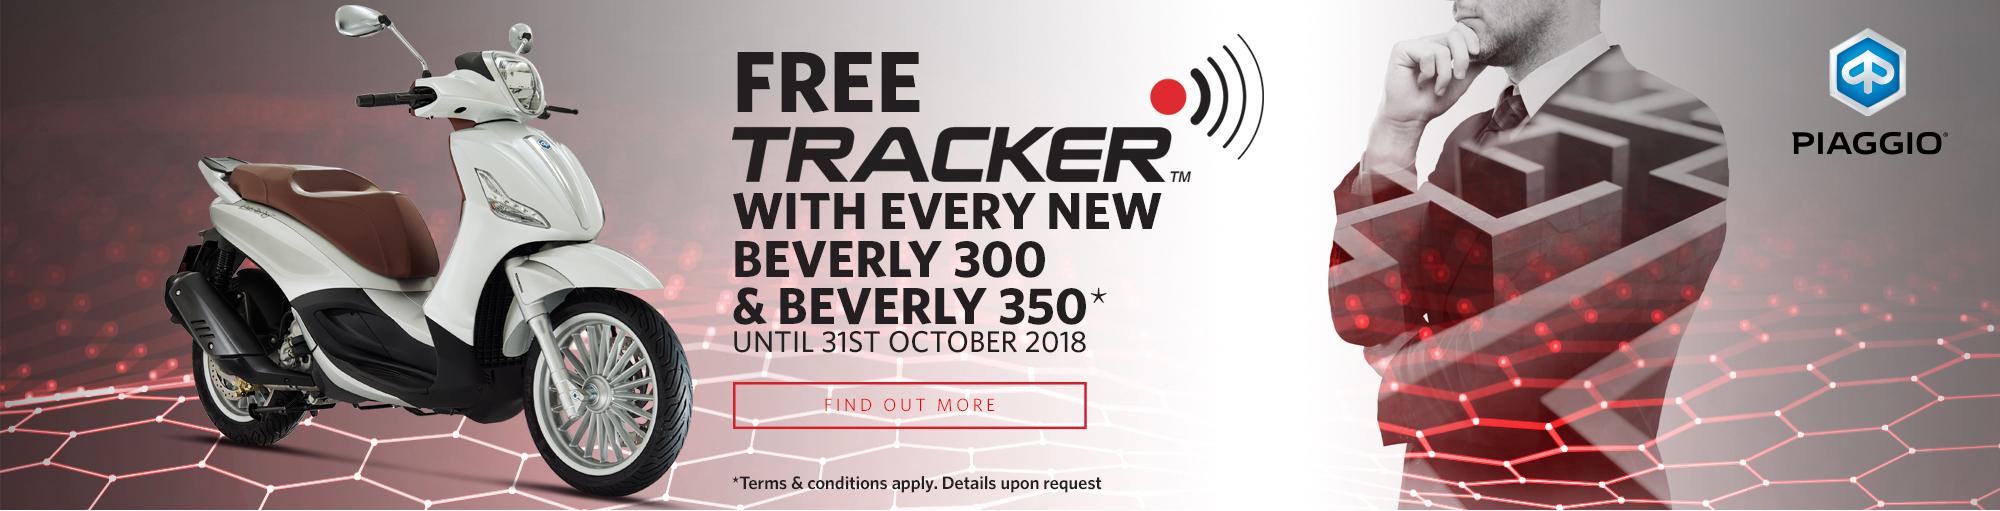 Beverly tracker